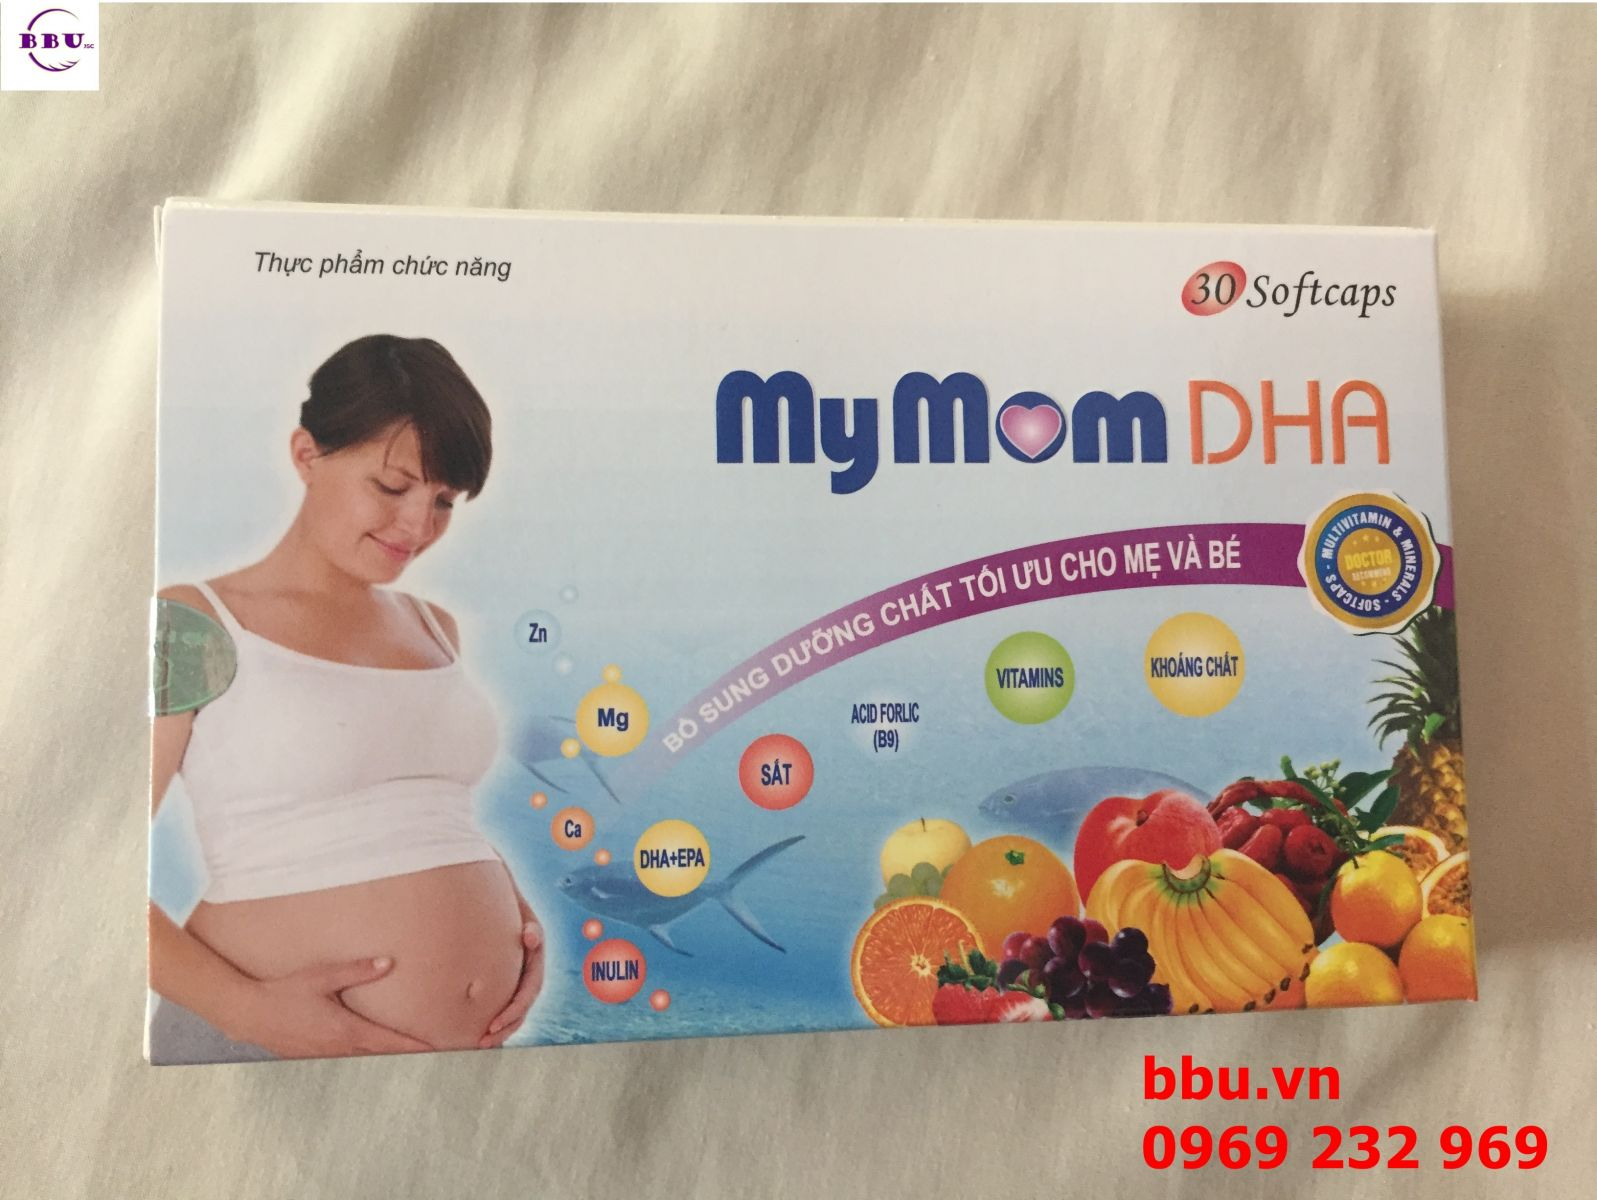 My-mom-DHA-30-vien-bo-sung-duong-chat-toi-uu-cho-me-va-be